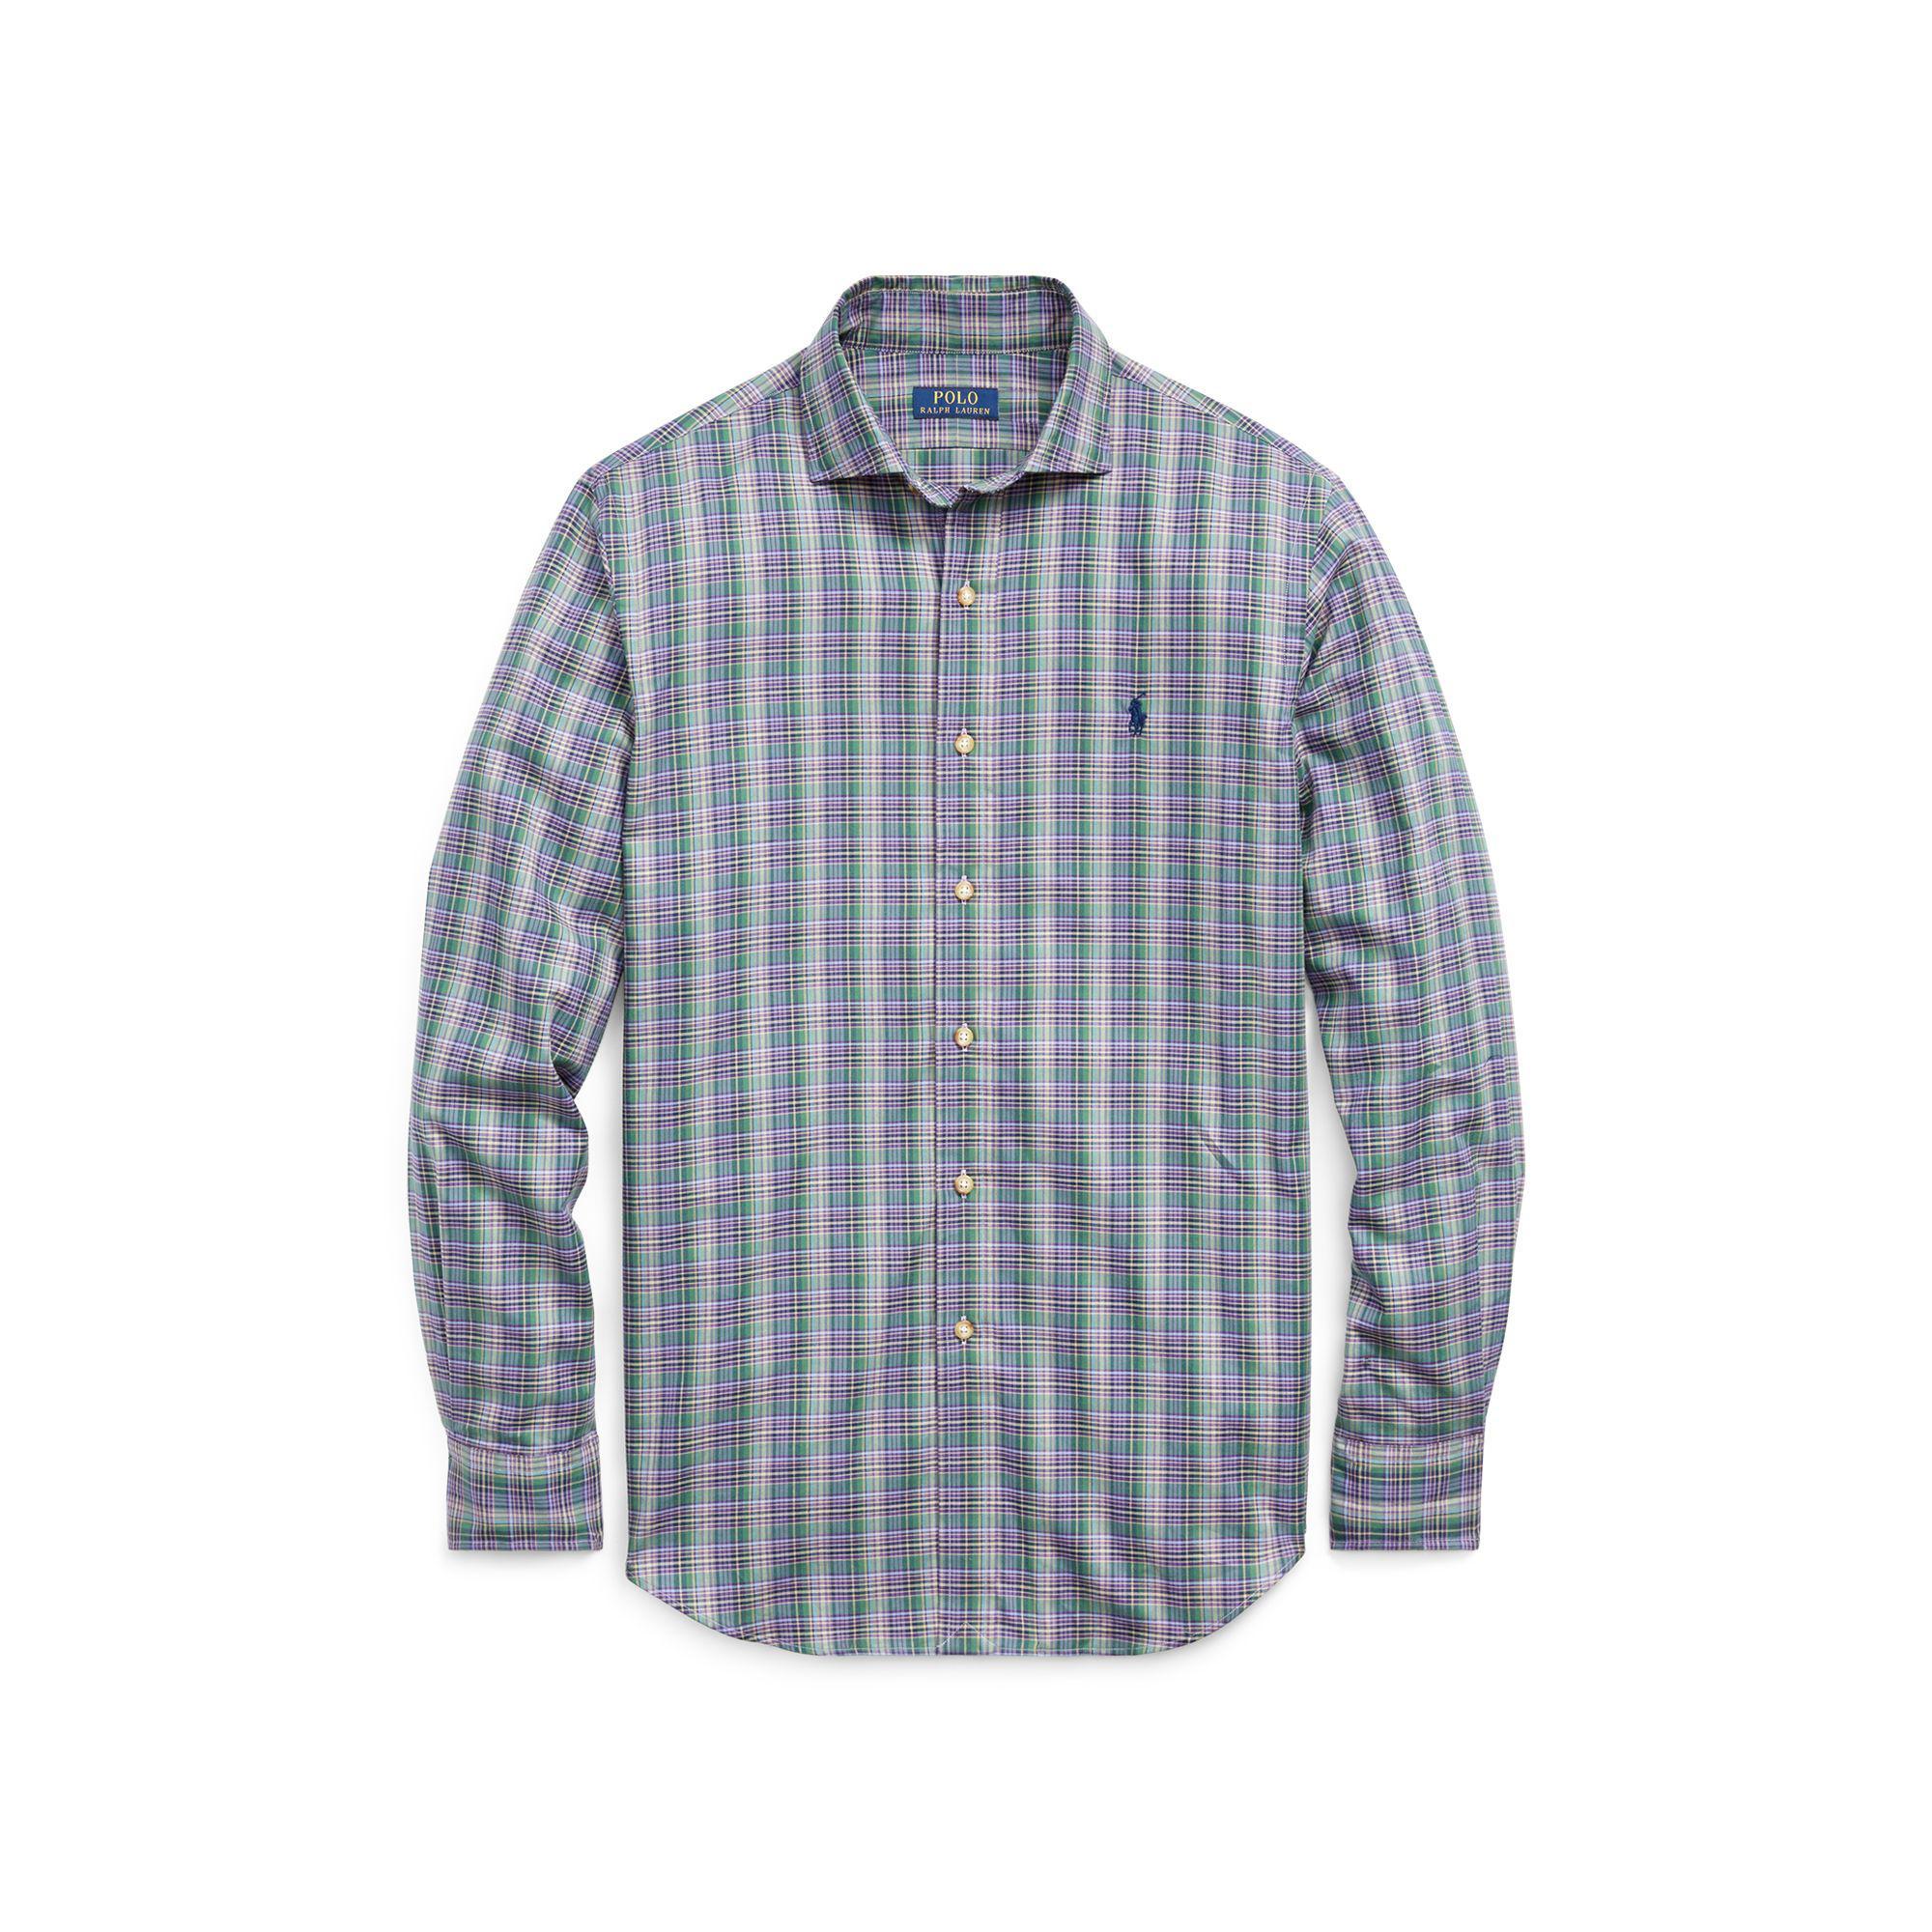 0d85c7b2e742 Polo Ralph Lauren Slim Fit Cotton Twill Shirt in Blue for Men - Lyst